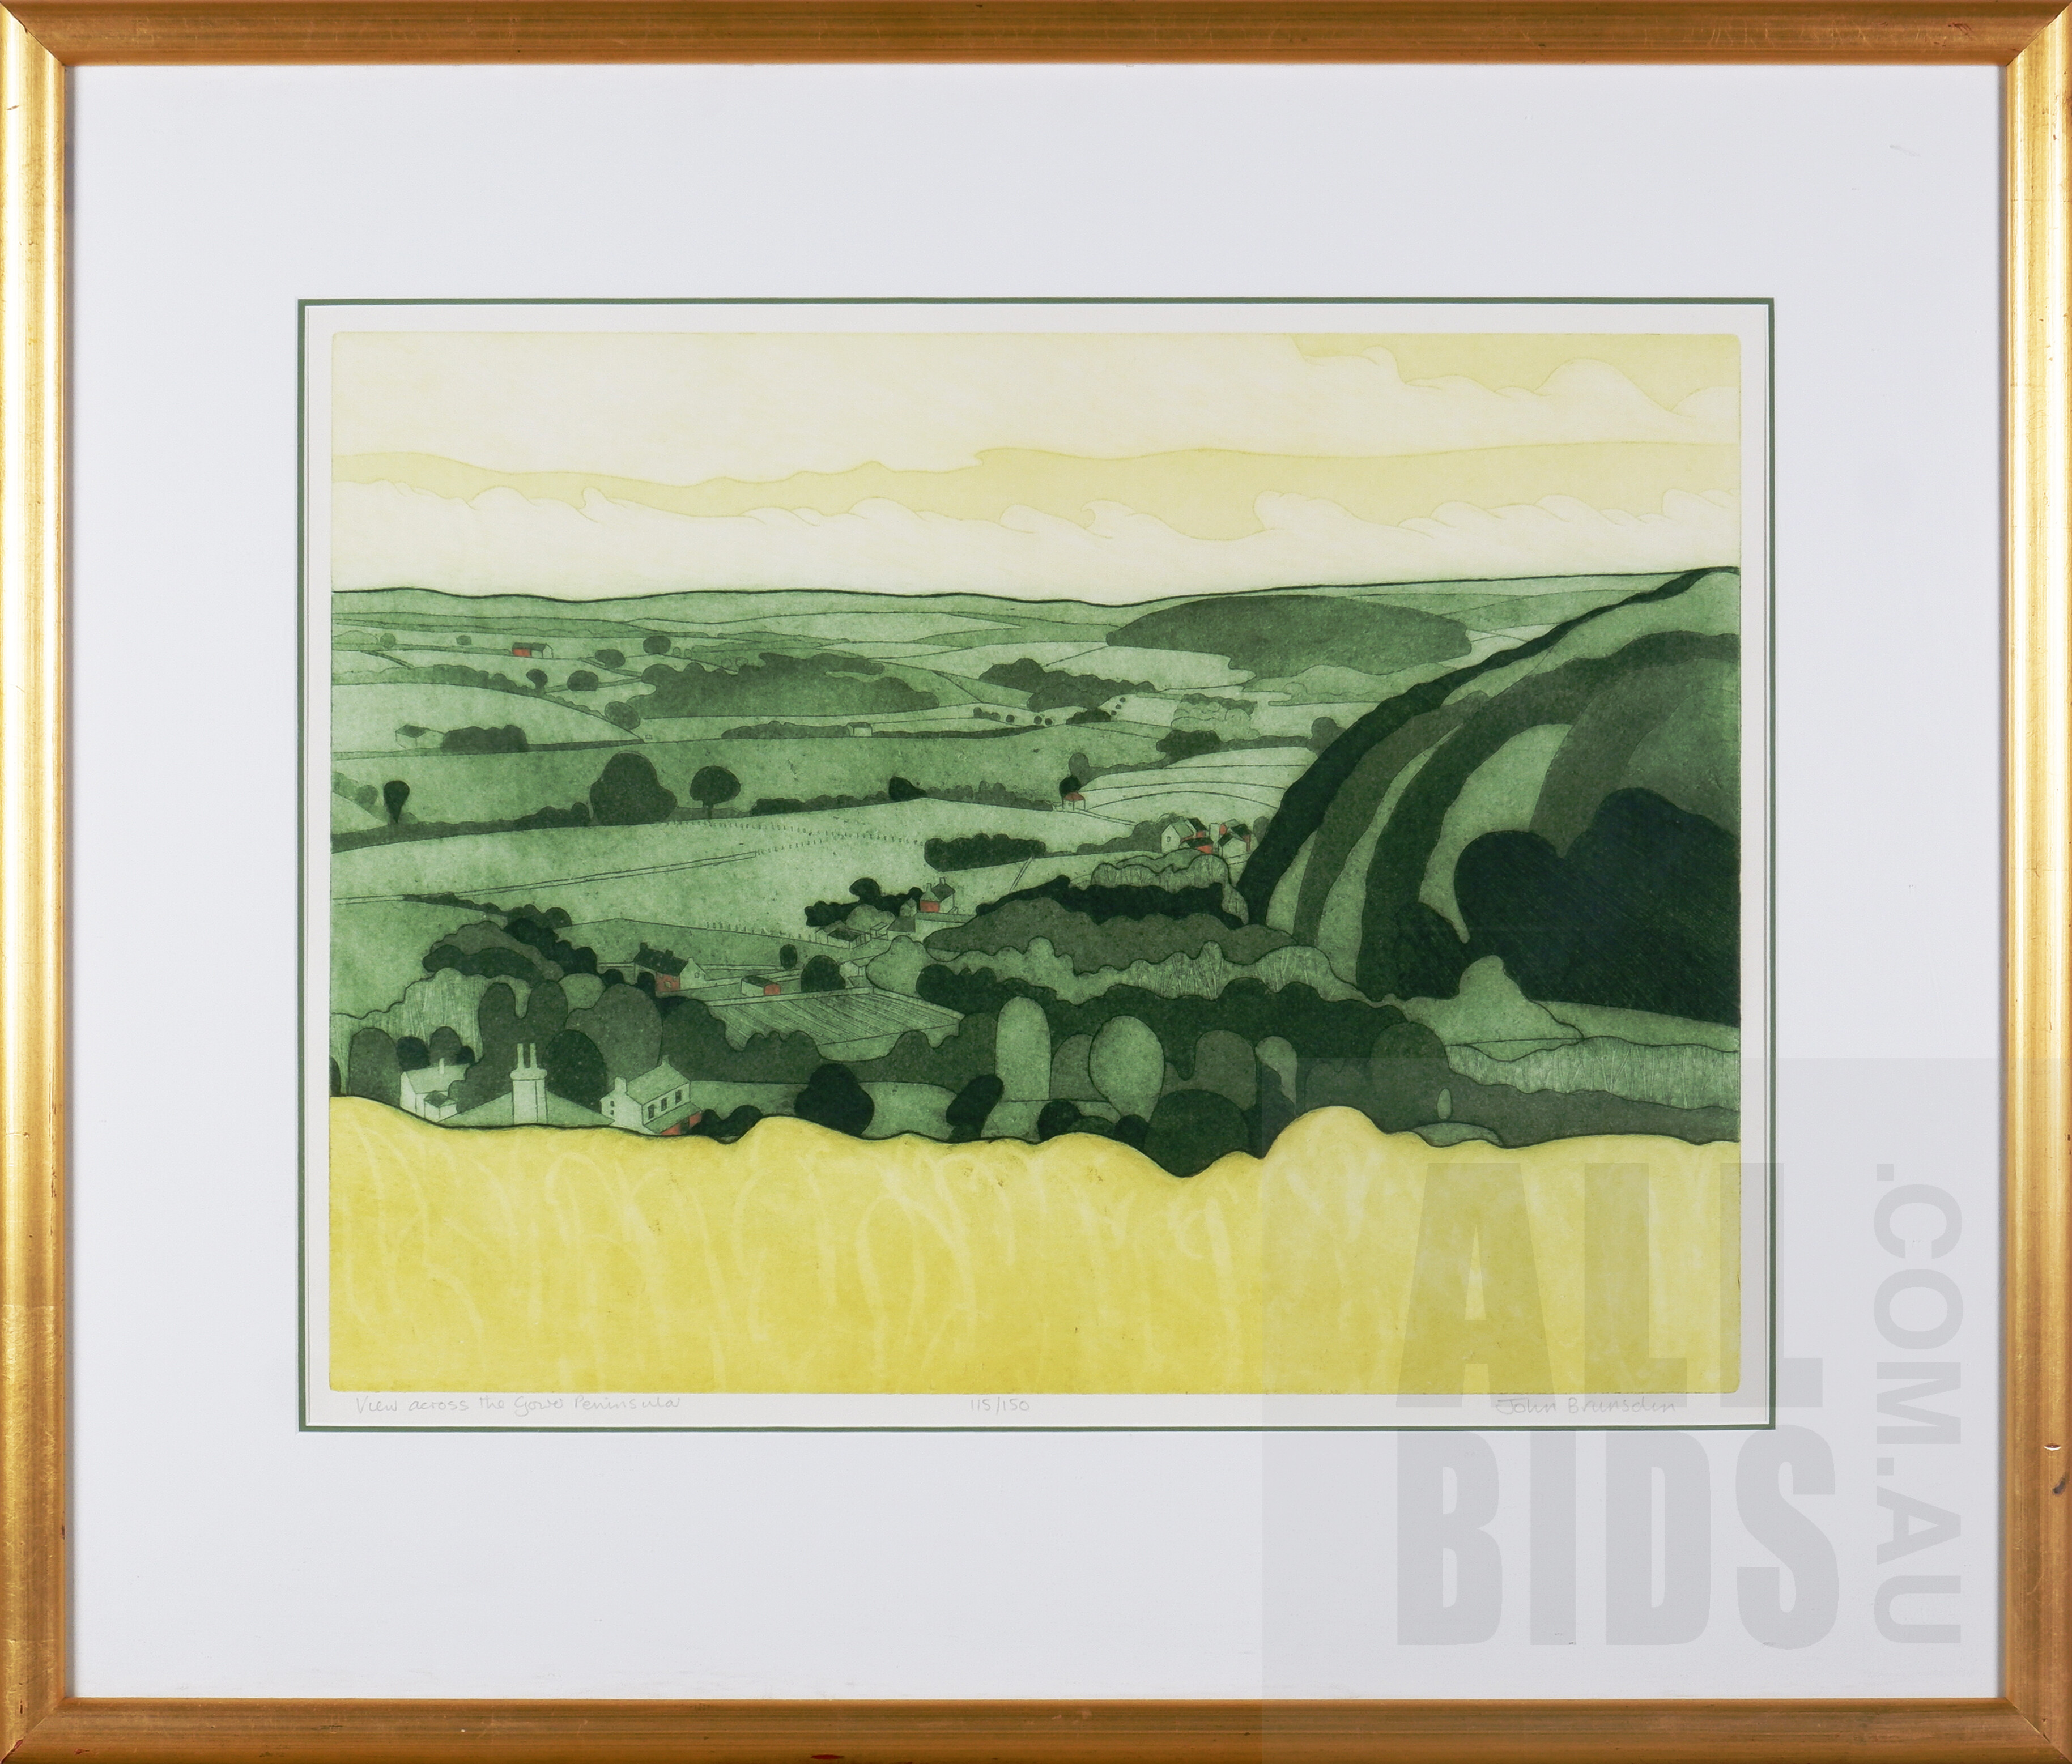 'John Brunsden (1933-2014, British), View Across the Gower Peninsula, Etching and Aquatint, 45 x 60 cm'